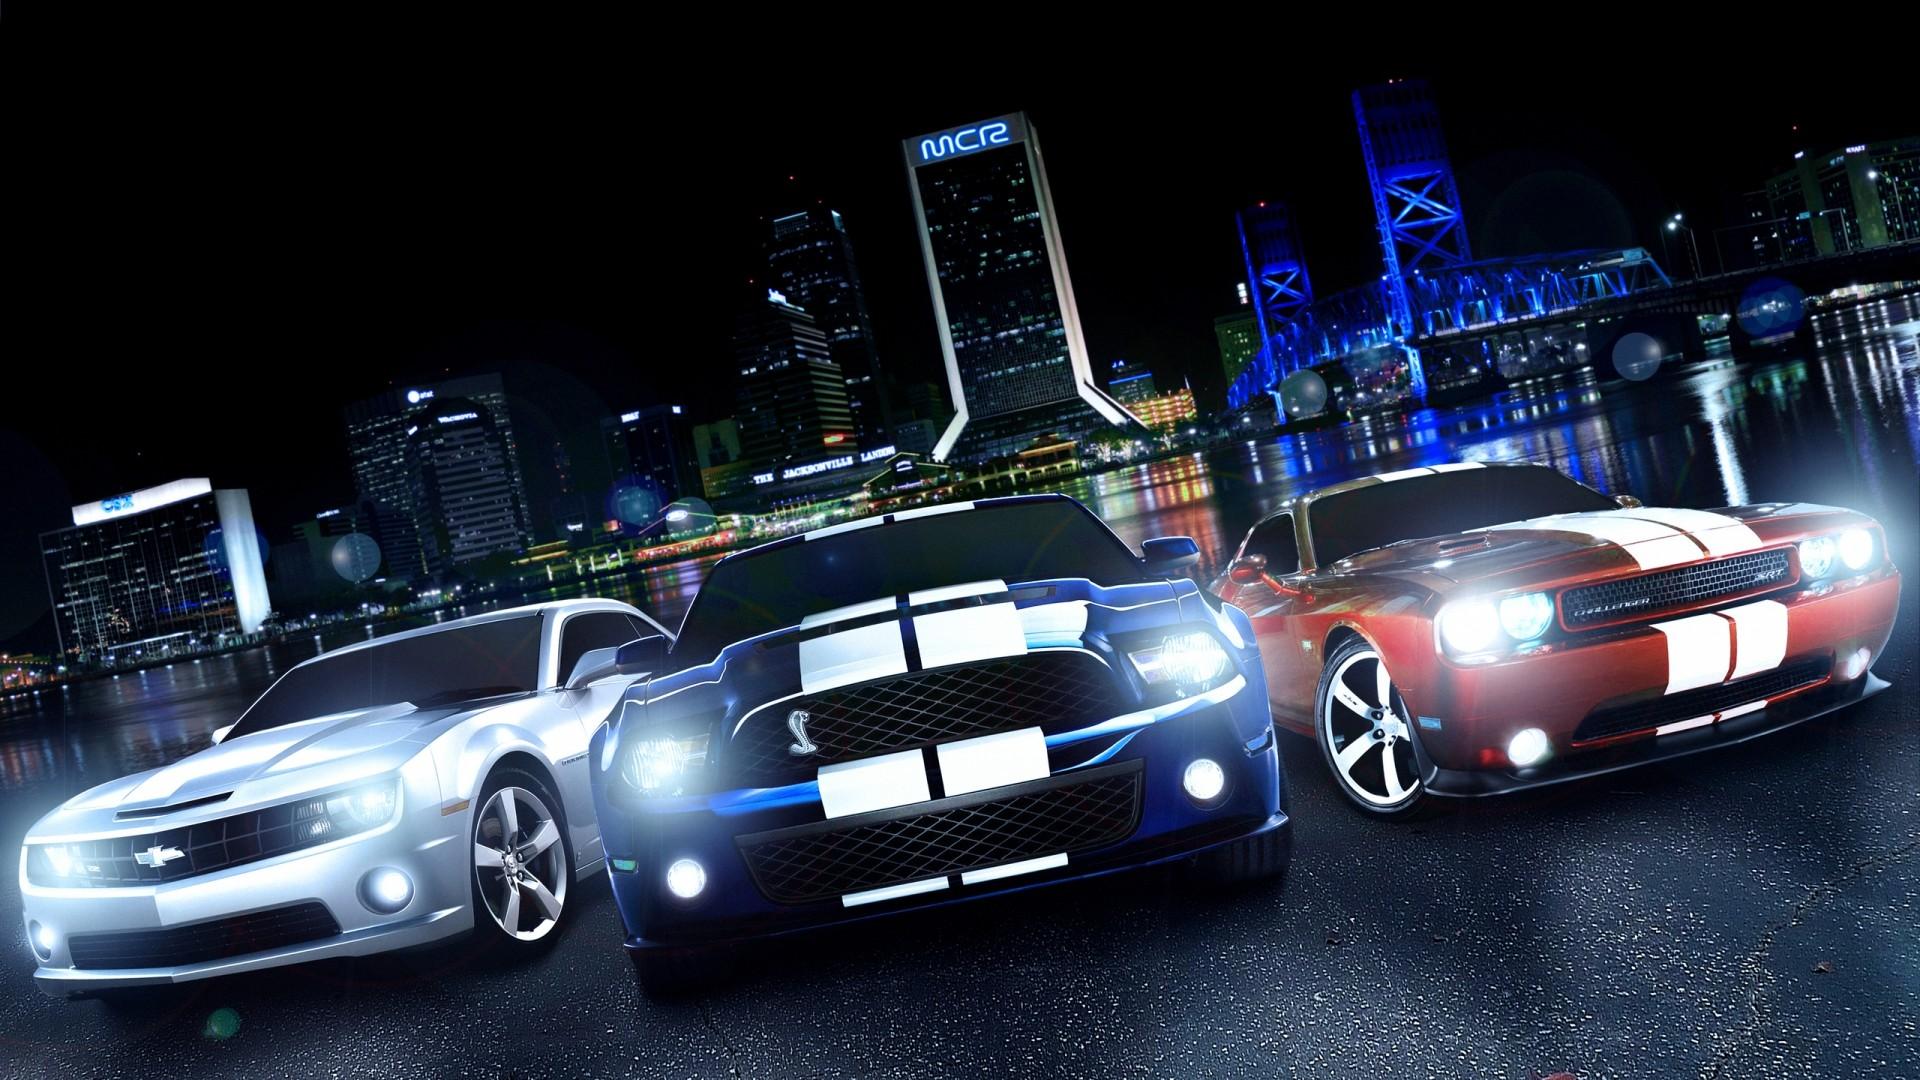 Res: 1920x1080, Car Wallpapers Desktop Background